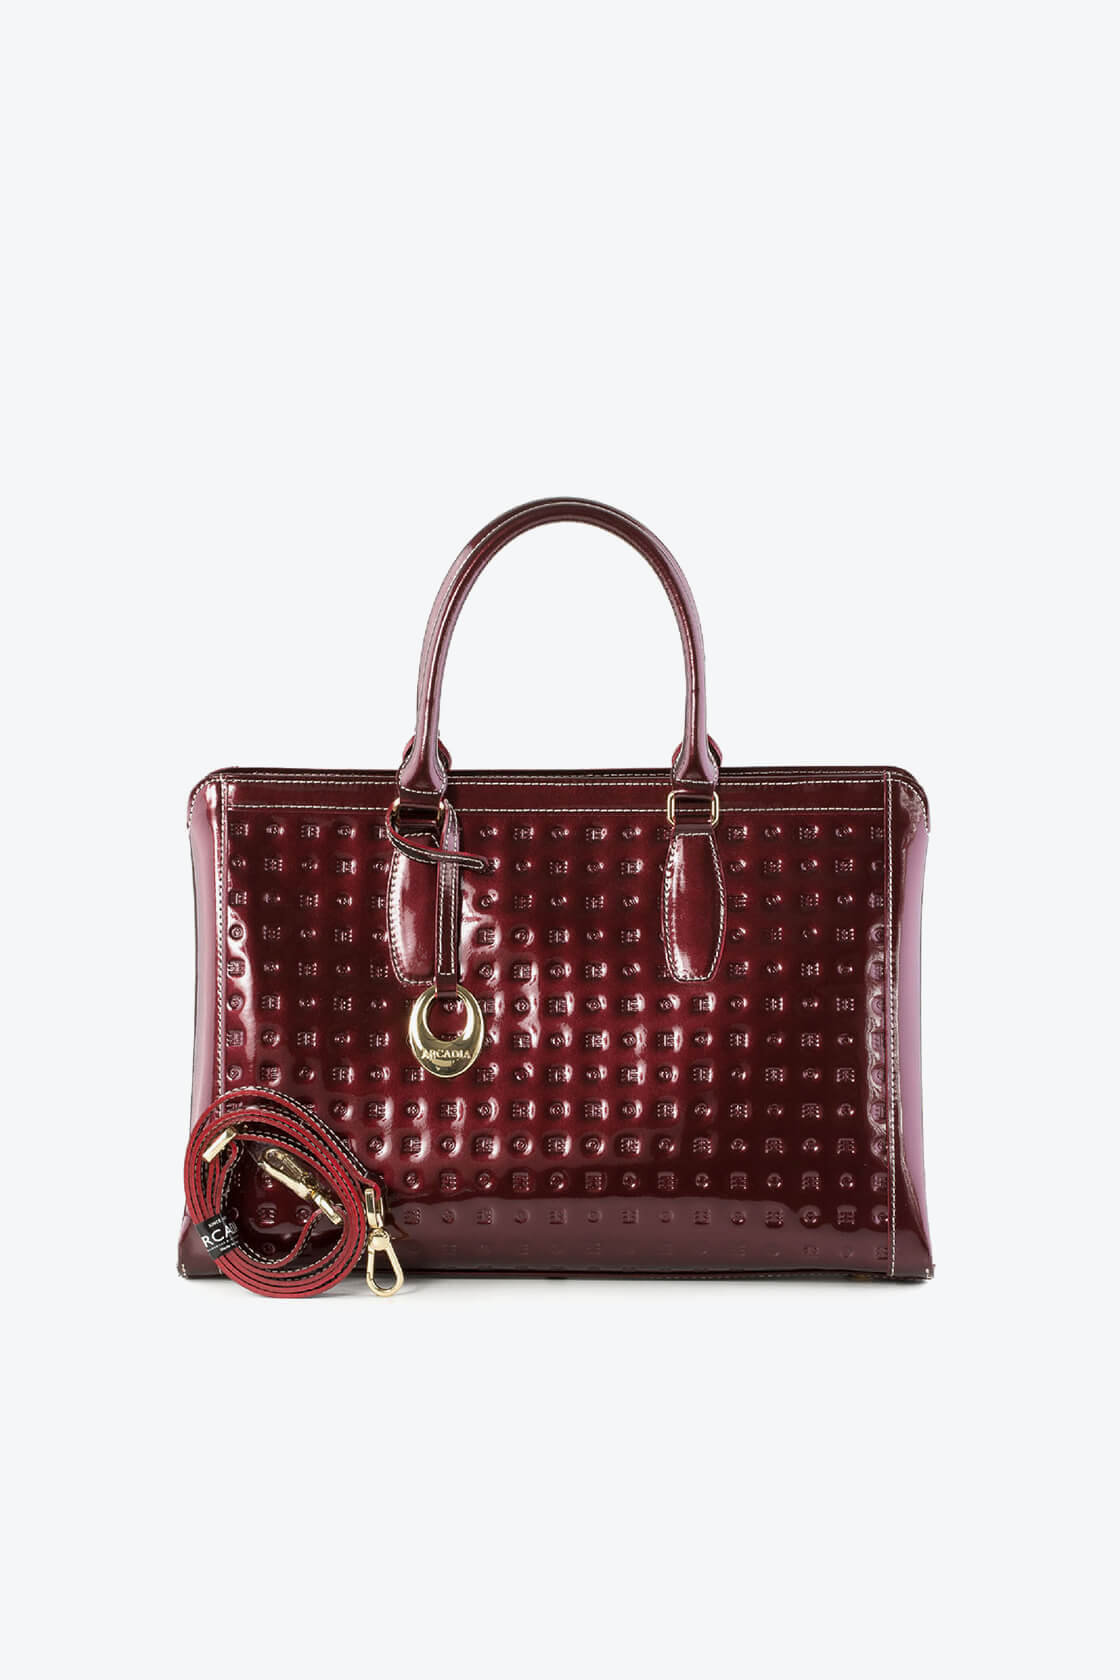 ol80000380 business large top handles bag 1